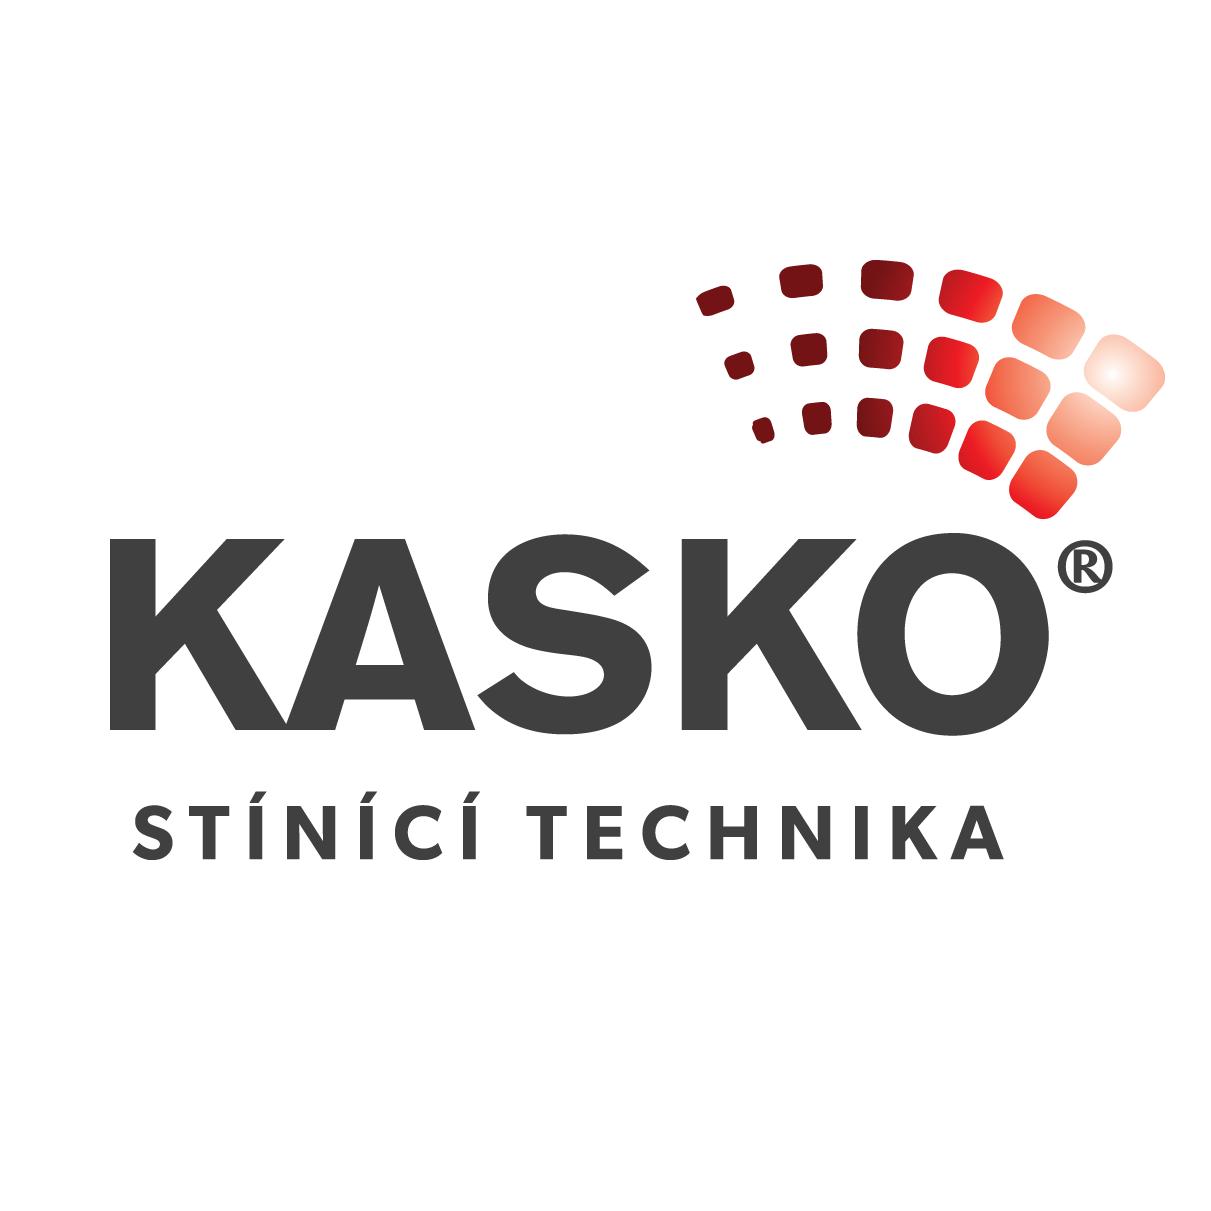 Kasko logo